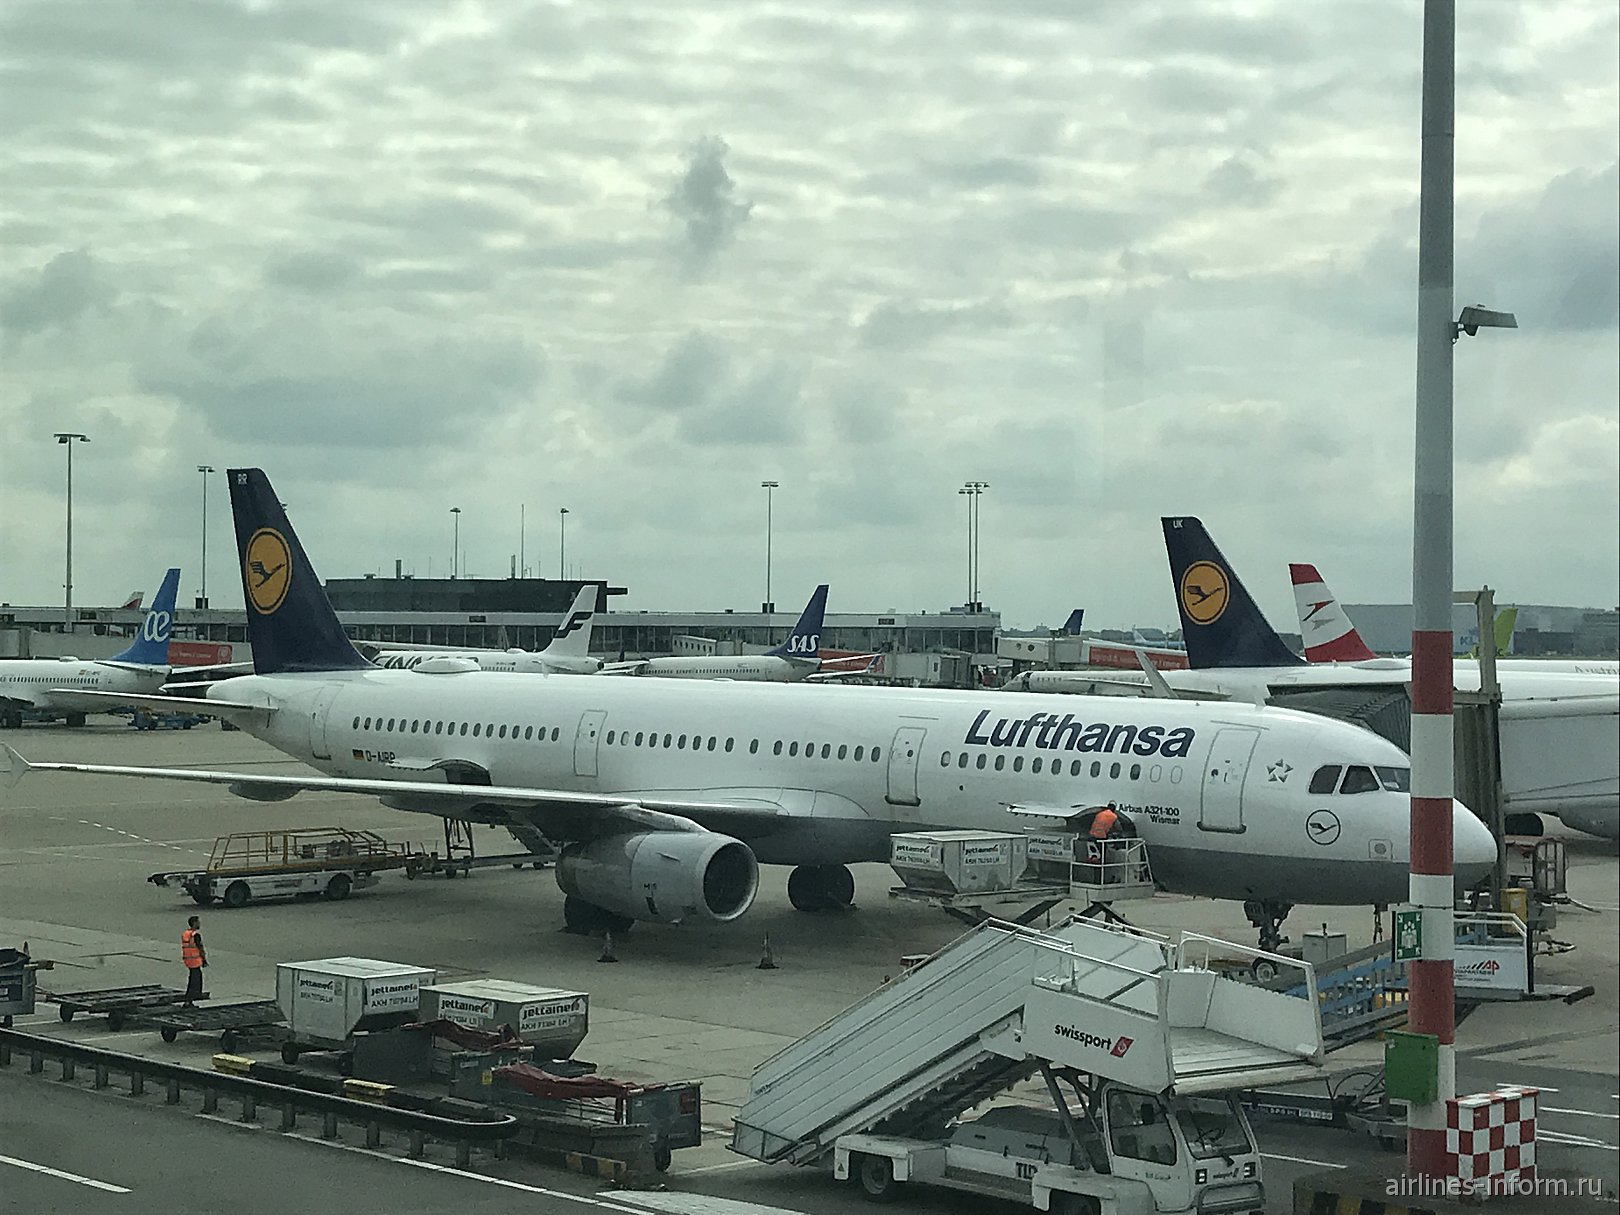 Амстердам (AMS) - Франкфурт (FRA) на Airbus A321 авиакомпании Lufthansa (100 фото)